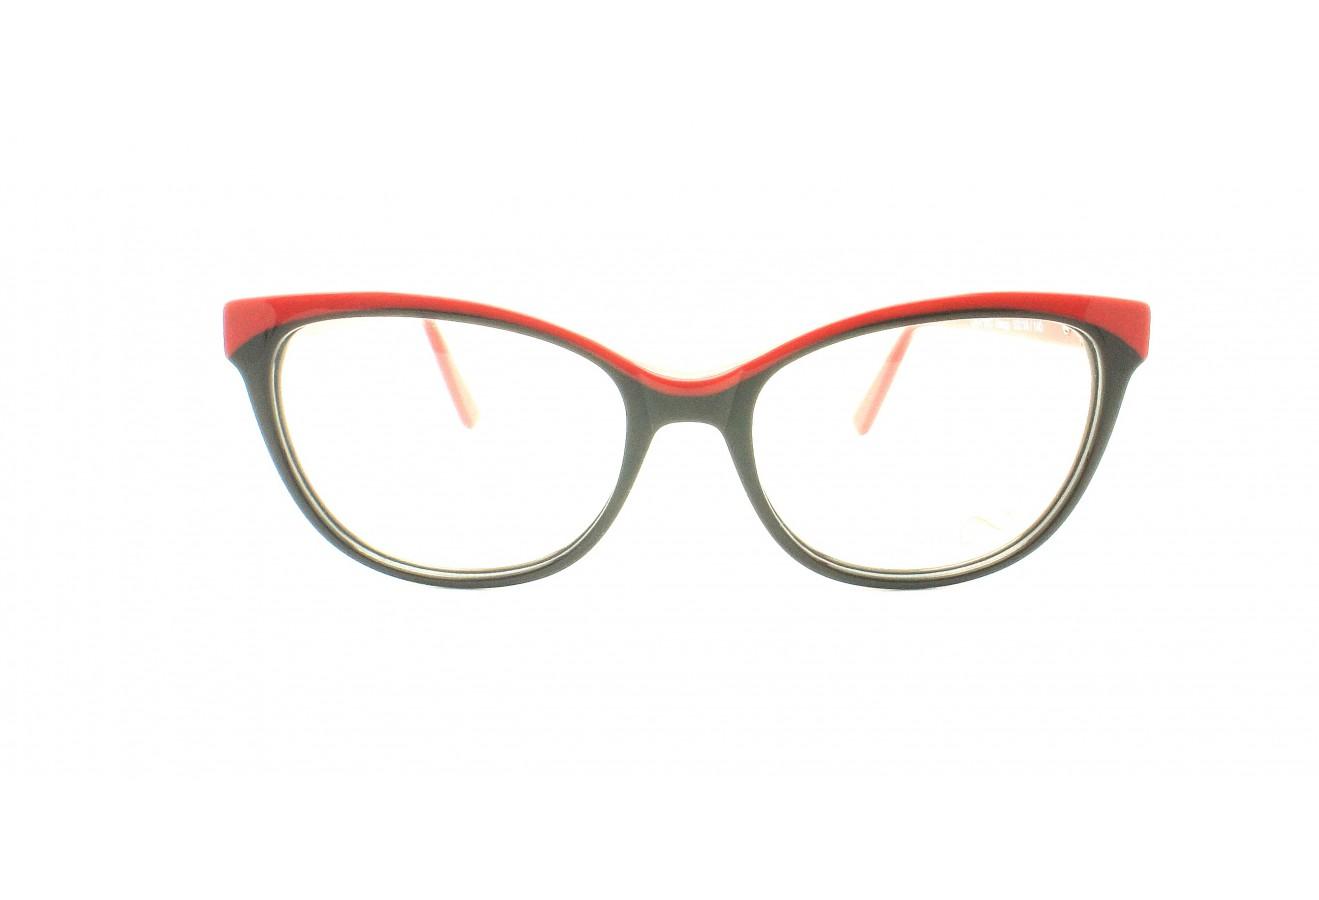 lunettes de vue 1796 cbfa1807 rouge 53 16. Black Bedroom Furniture Sets. Home Design Ideas